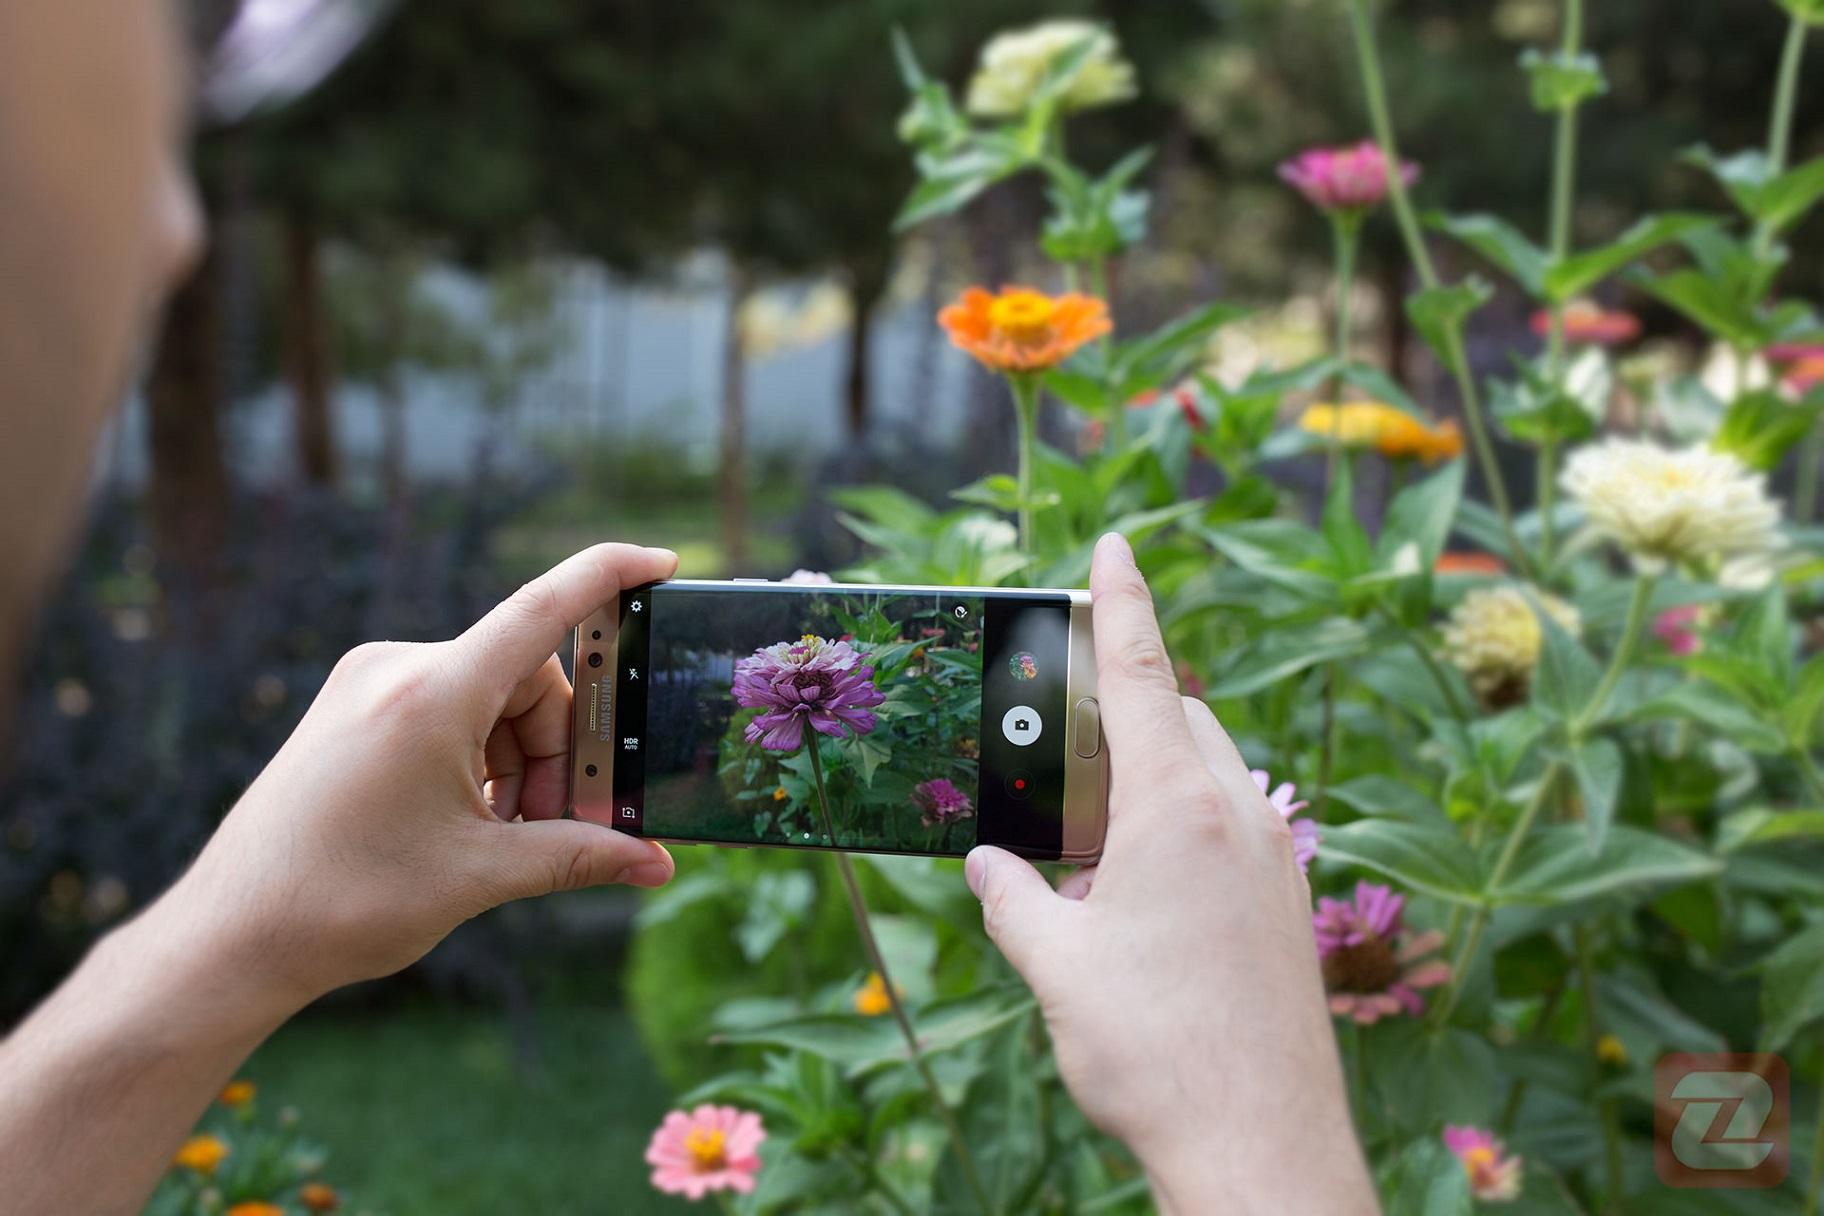 Galaxy Note 7 - Camera